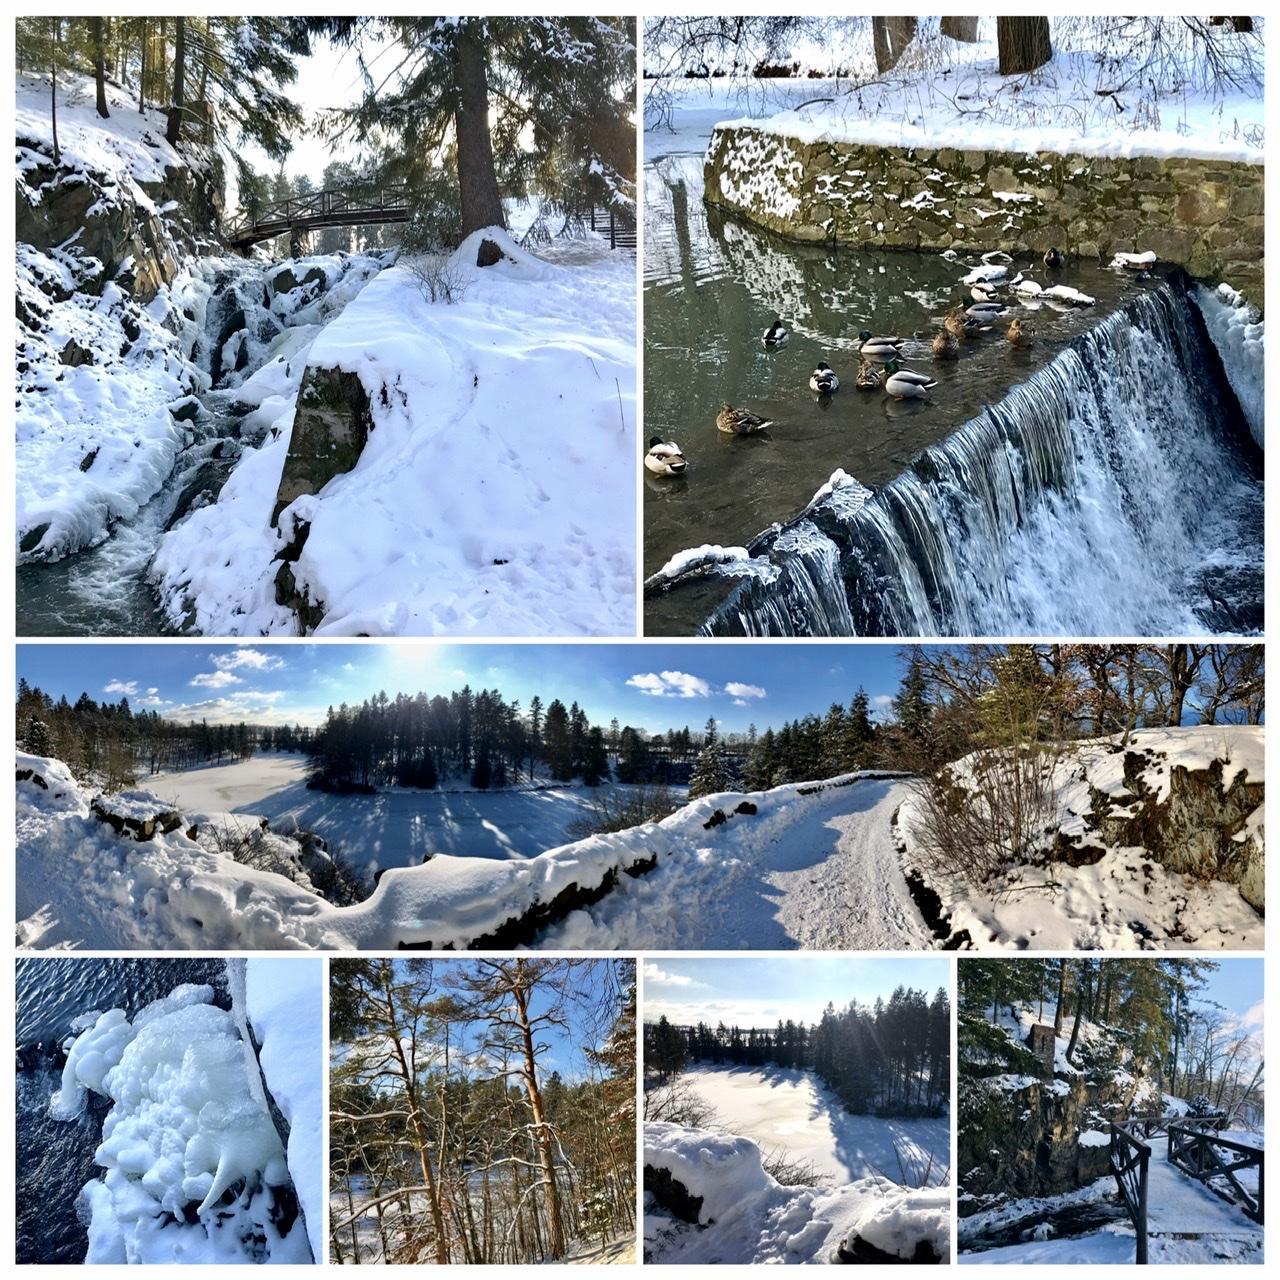 Naše L-ko - 2021 - stále dokončujeme - naše denné vychádzky - 10 minut pešo od domčeka, zima čaruje - posledné zamraznuté dni